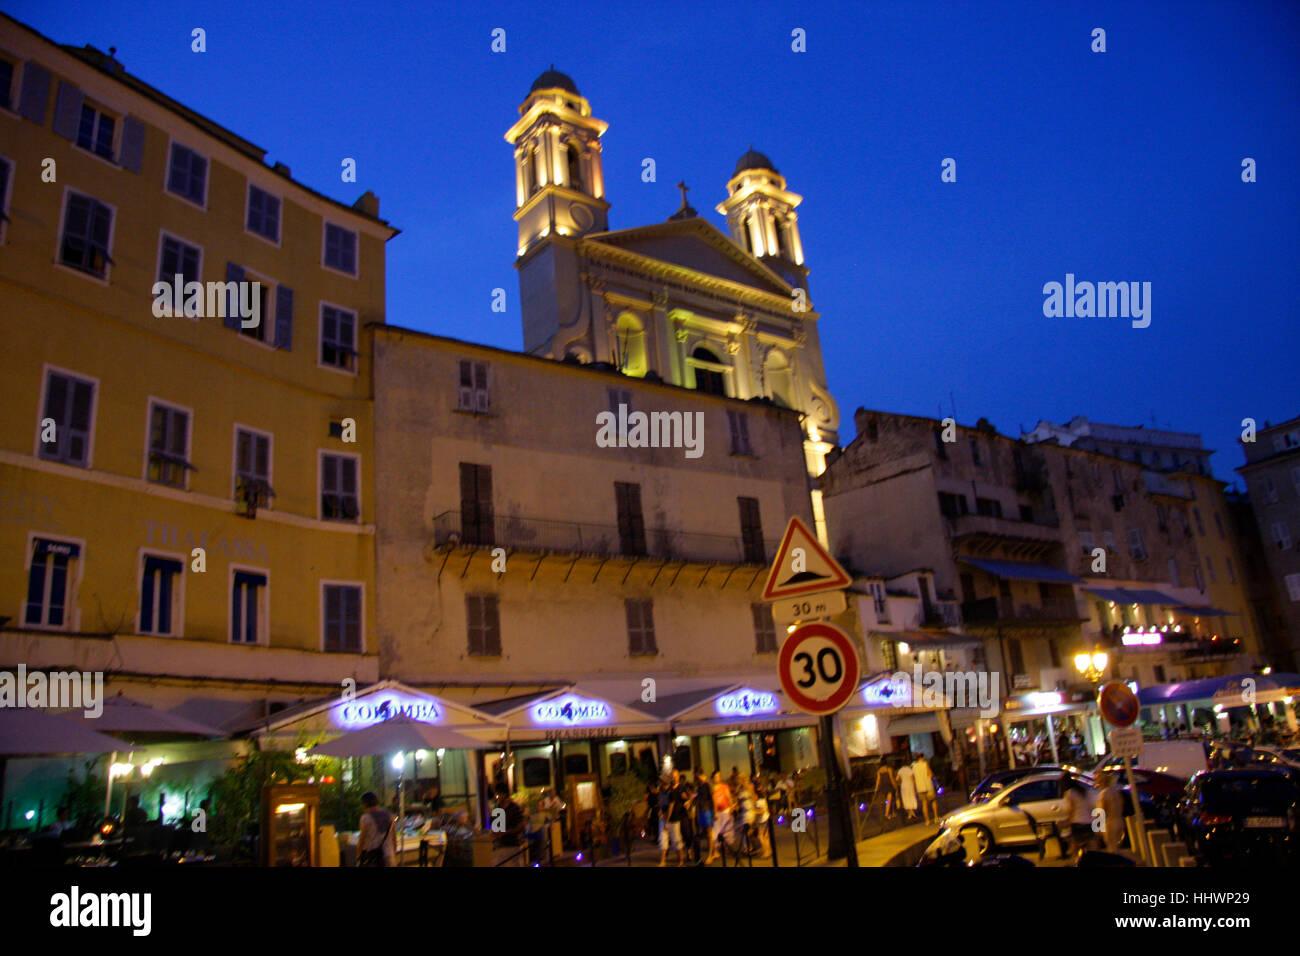 Impressionen: Paroisse Saint Jean-Baptiste, Abendstimmung, Bastia, Kosika, Frankreich. - Stock Image